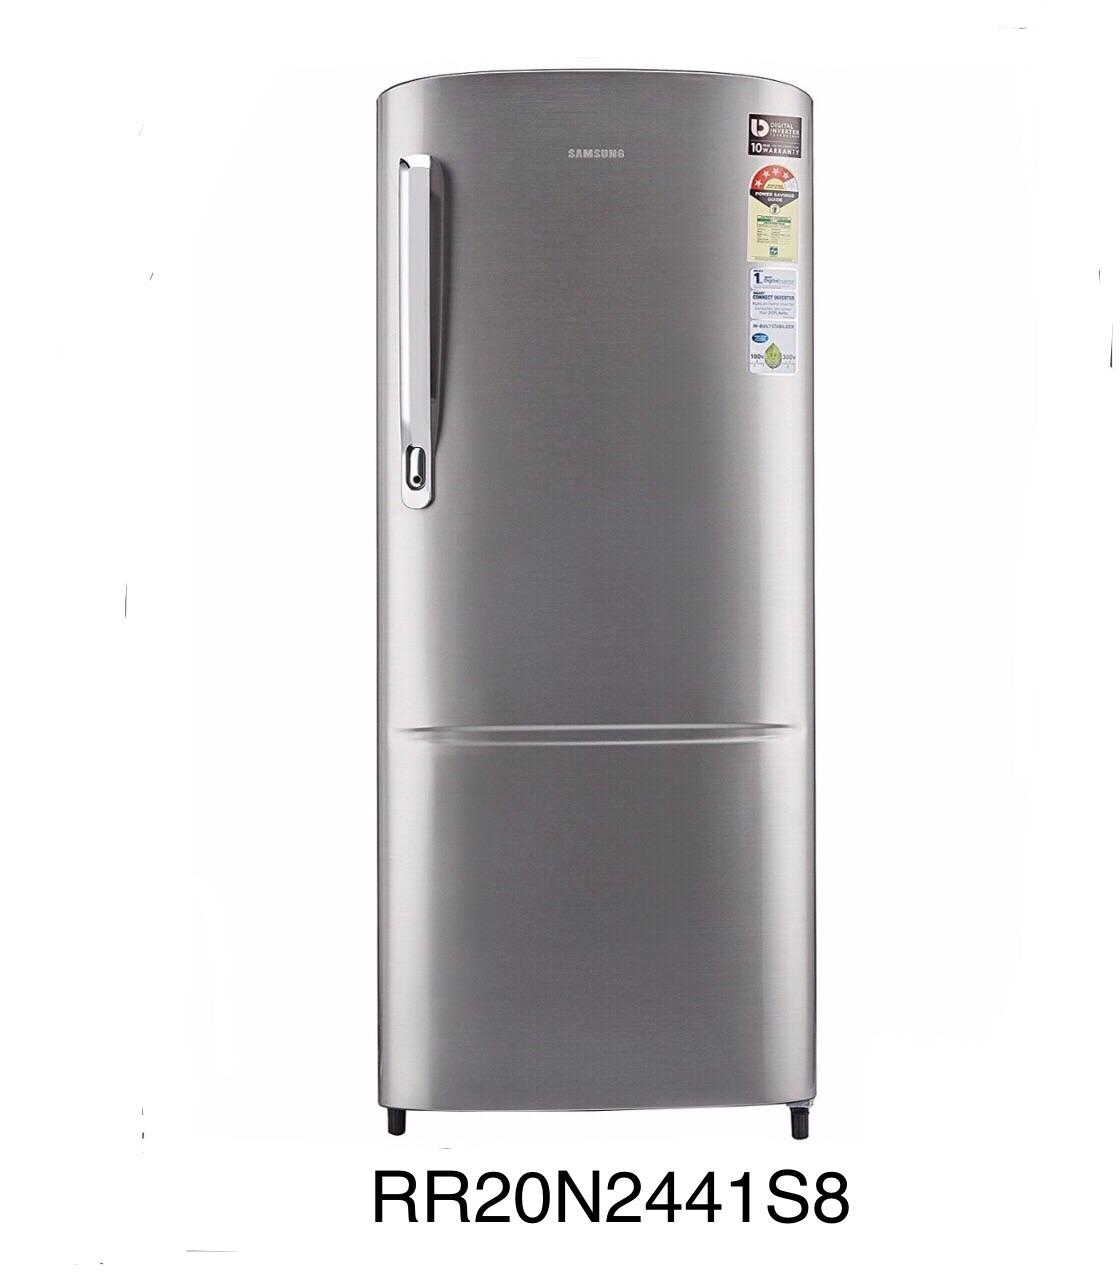 Samsung RR20N2441S8 192 Ltr Direct Cooling Single Door Refrigerator - Silver